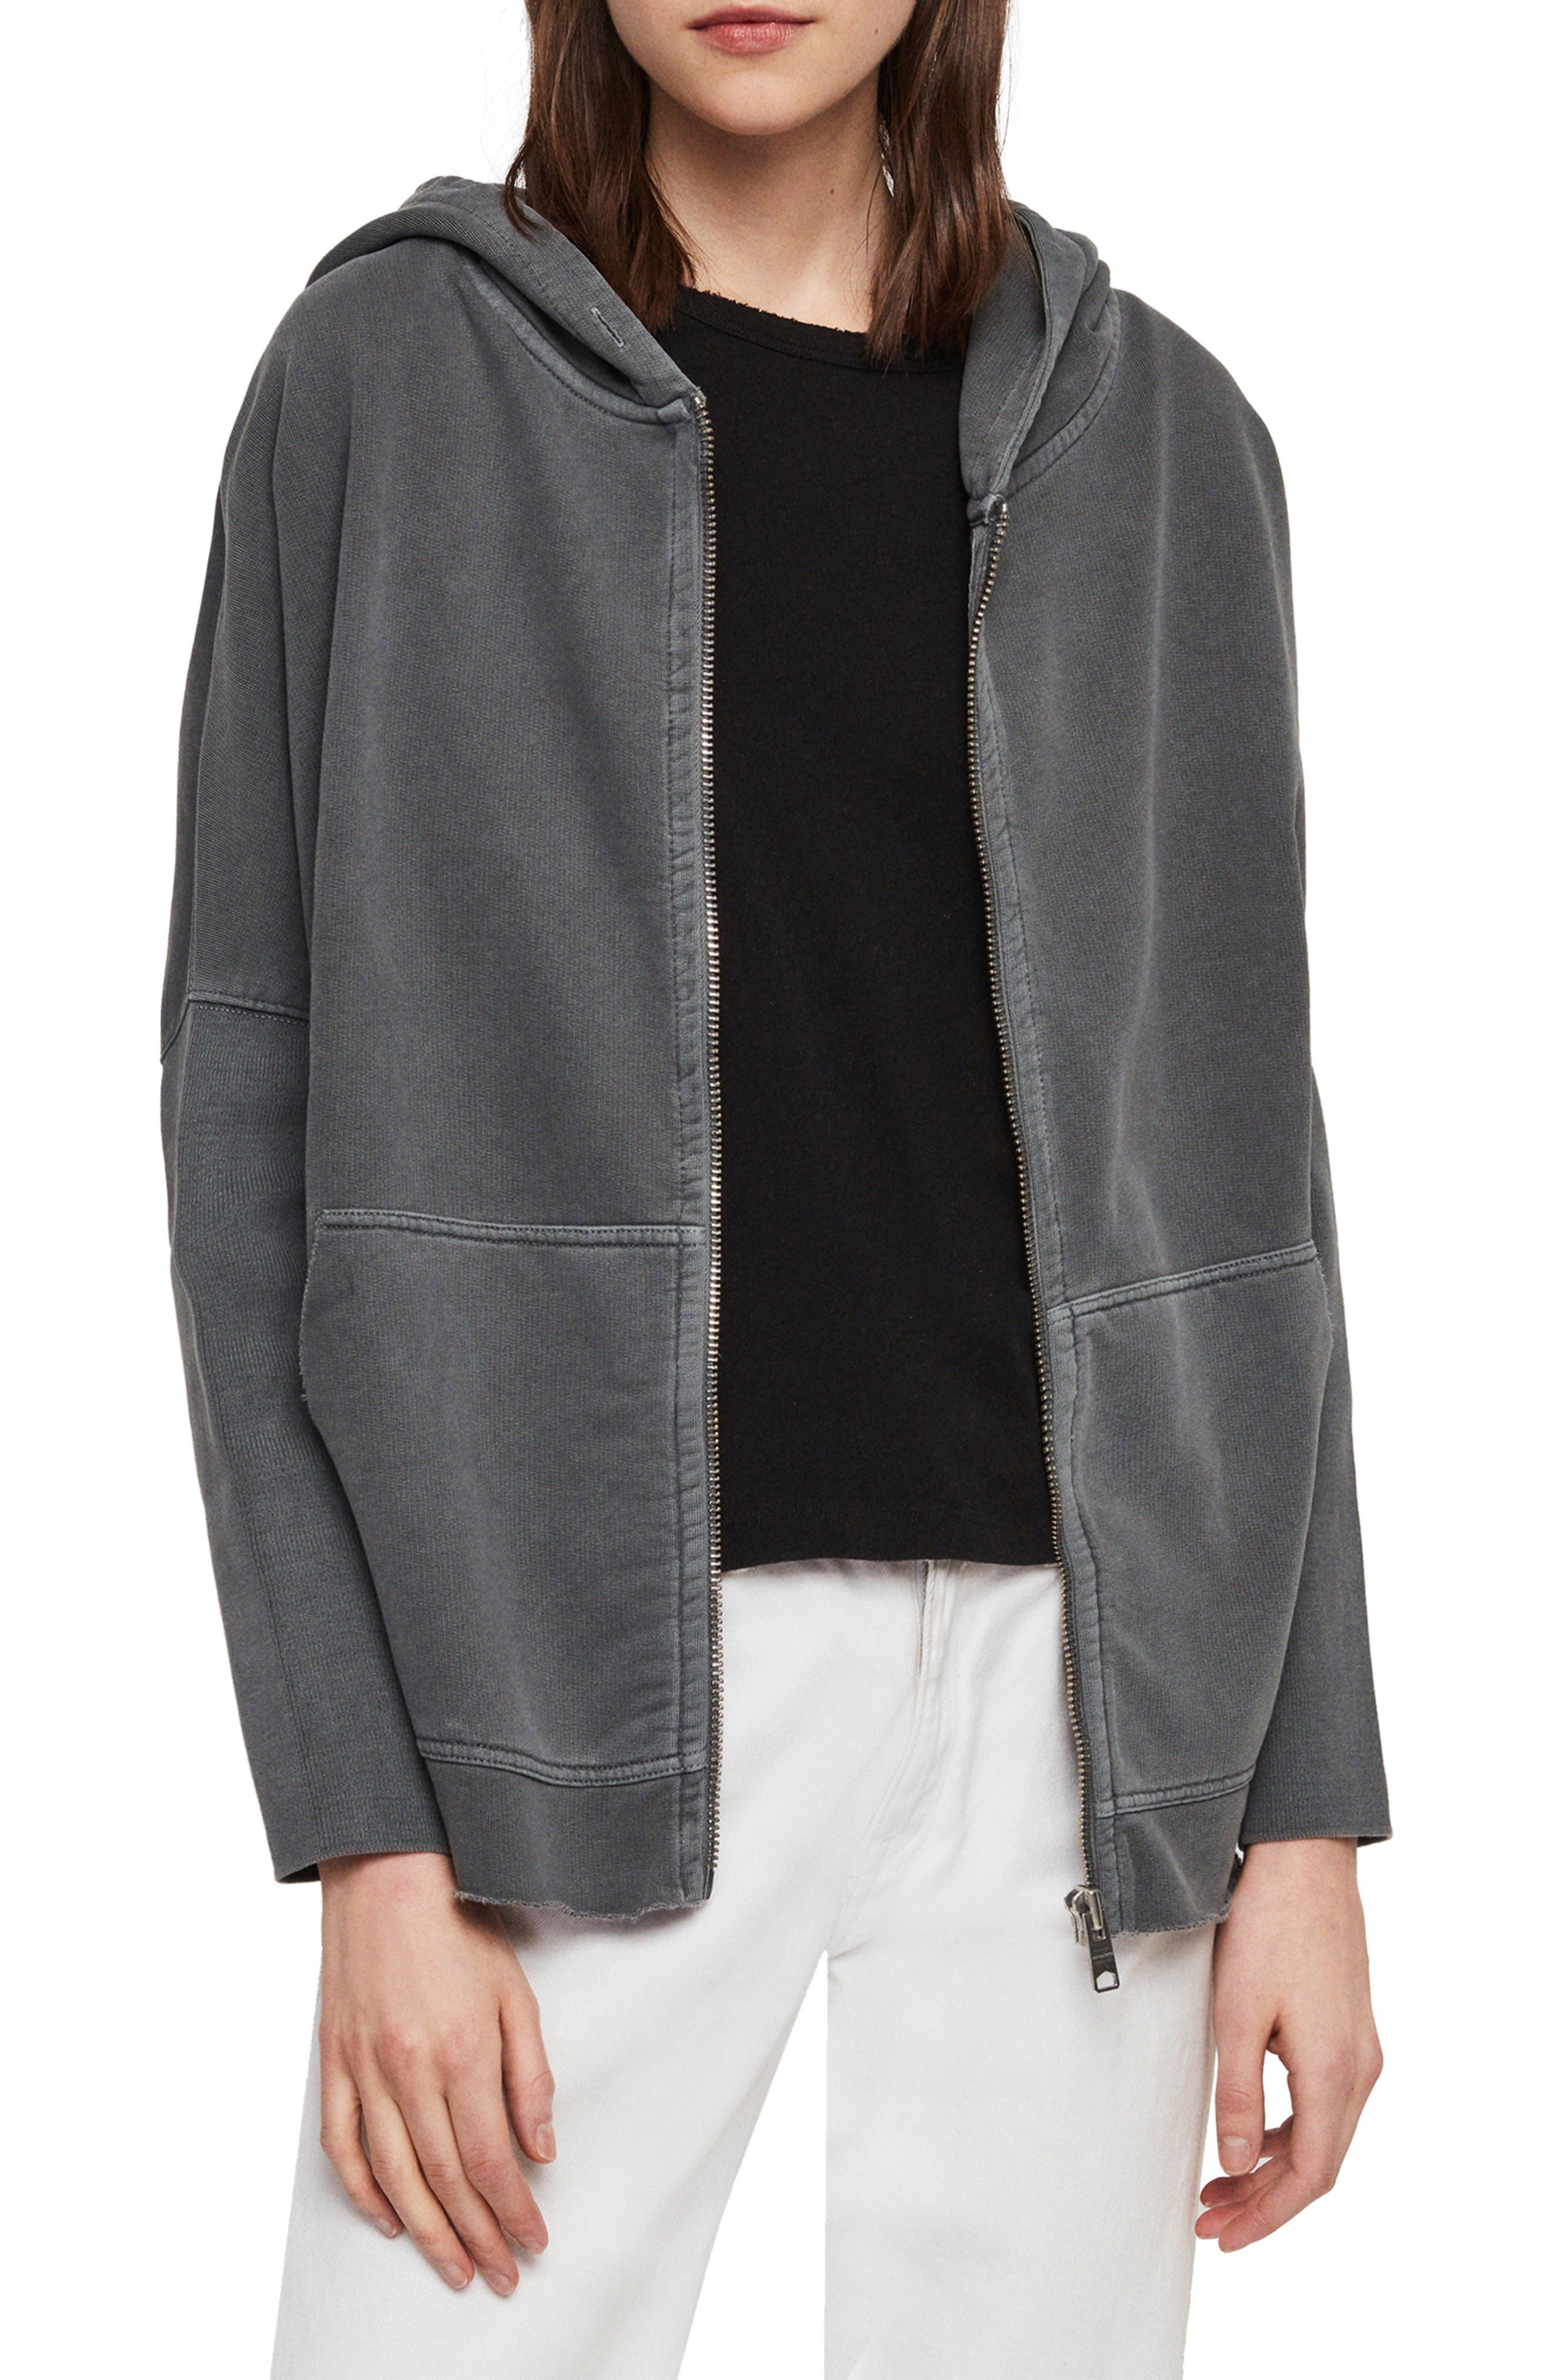 Allsaints Xonda Zip Hooded Sweatshirt, Black